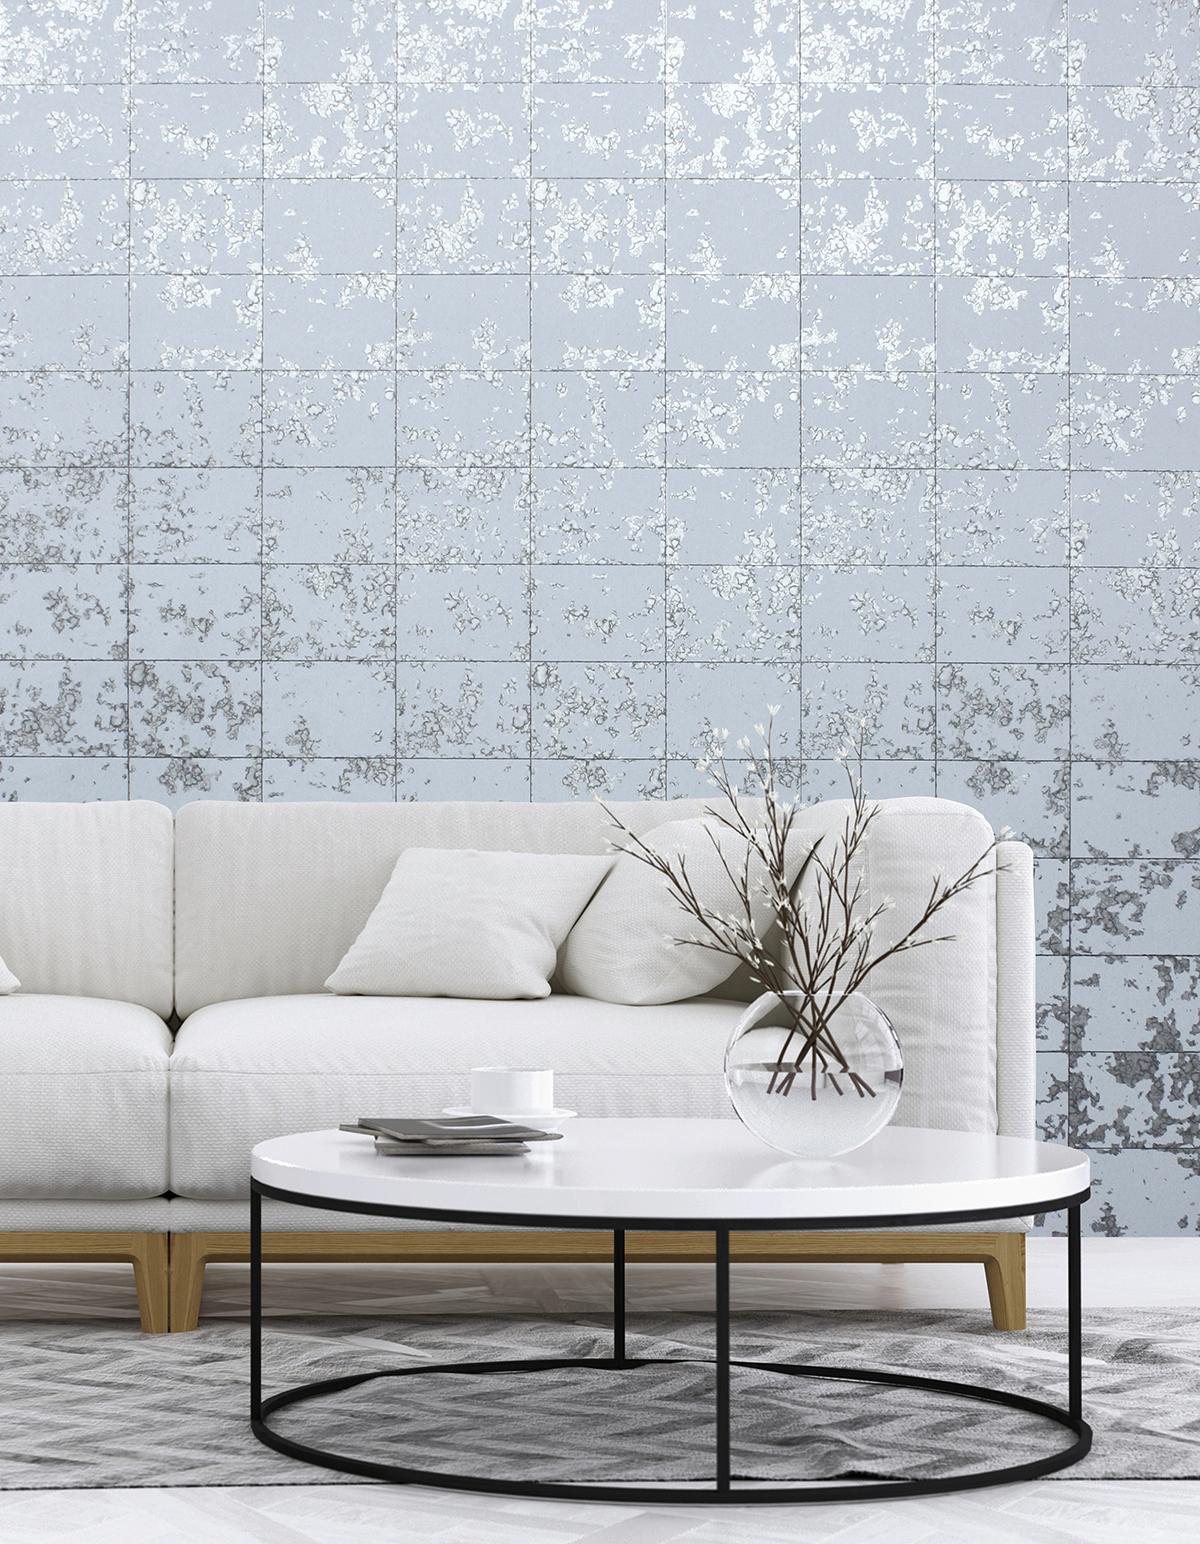 Papier Peint Effet Miroir papier peint dalle miroir gris bleuté - hexagone d'ugépa